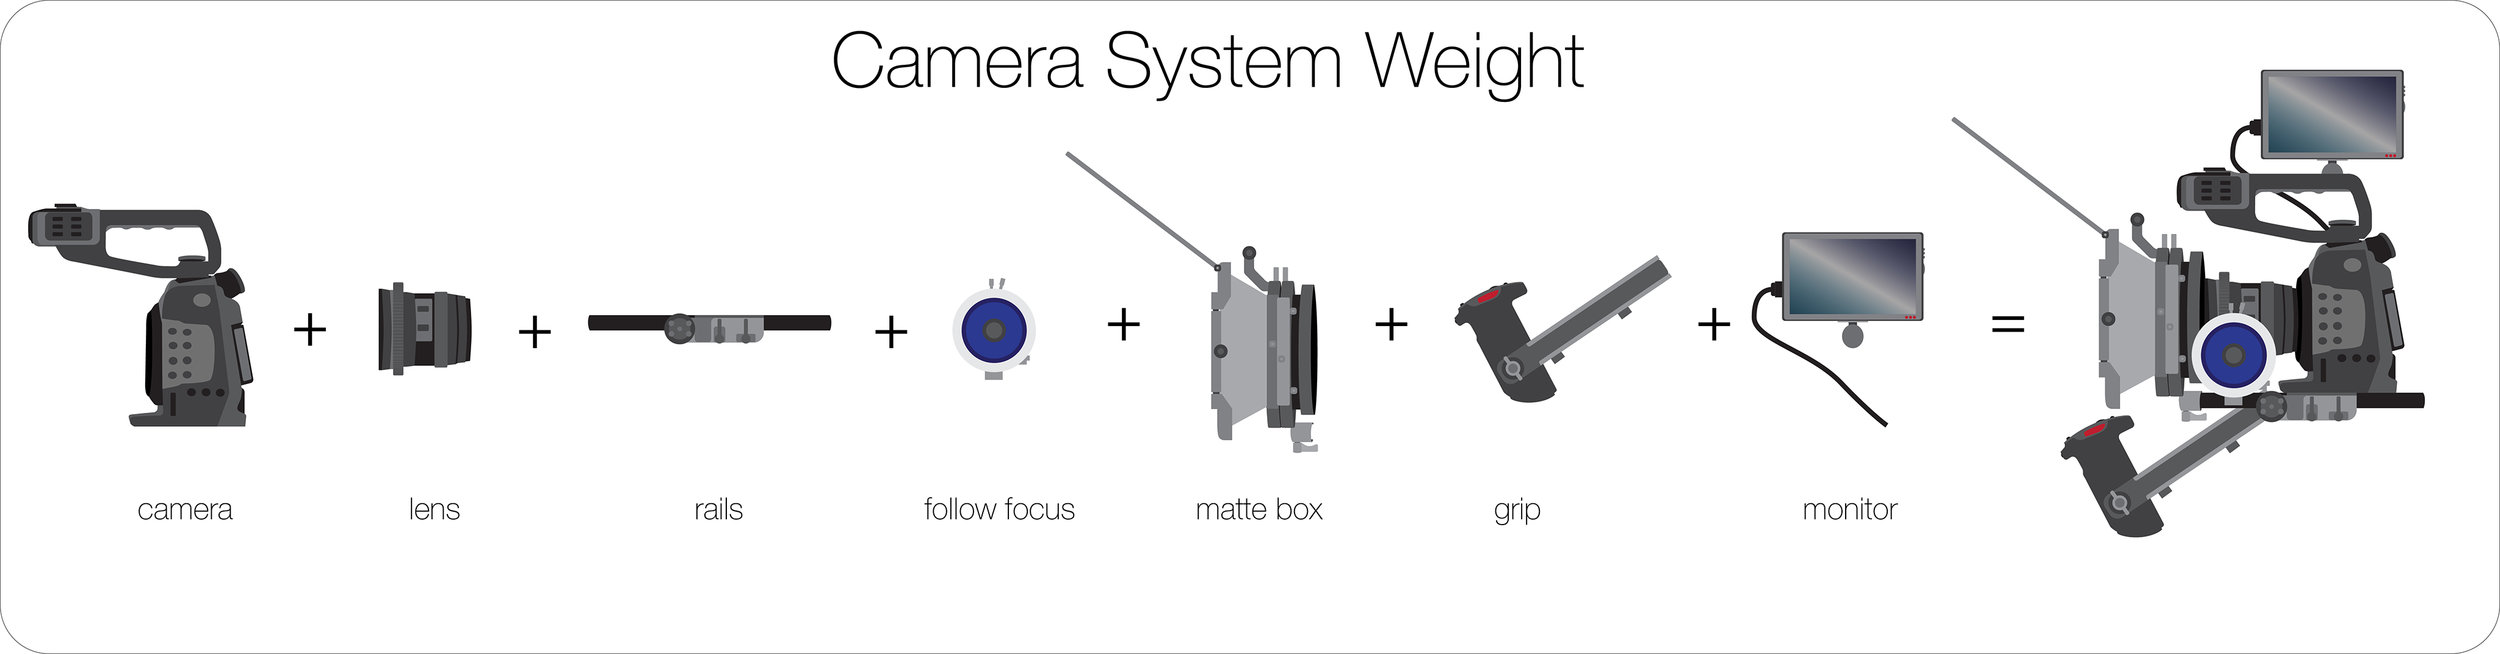 Camera System Weight.jpg